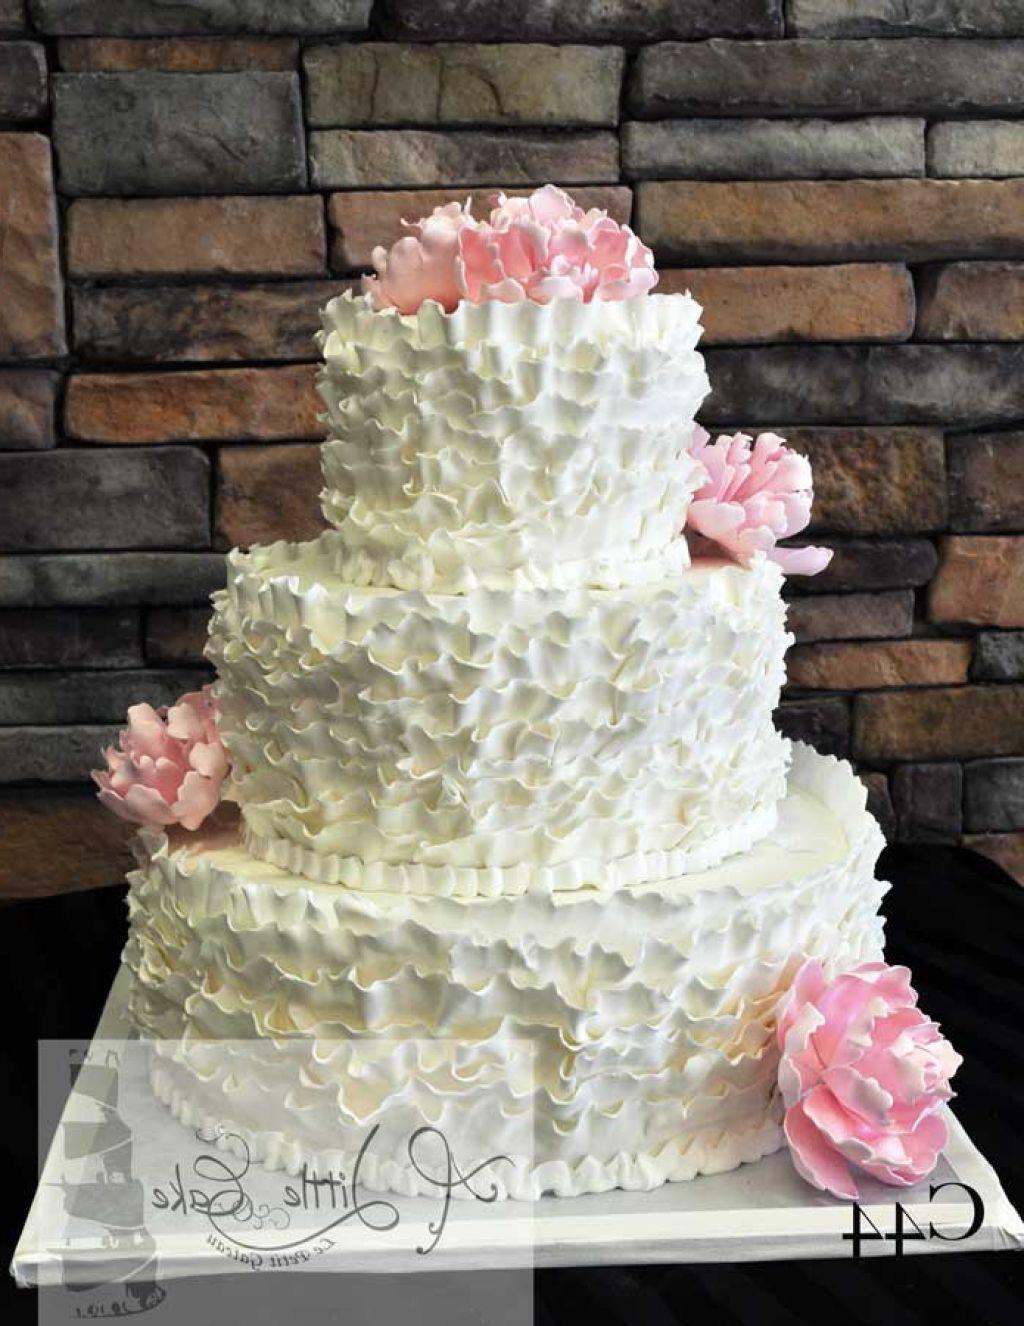 Walmart 3 Tier Wedding Cakes Google Search Walmart Wedding Cake 3 Tier Wedding Cakes Tiered Wedding Cake